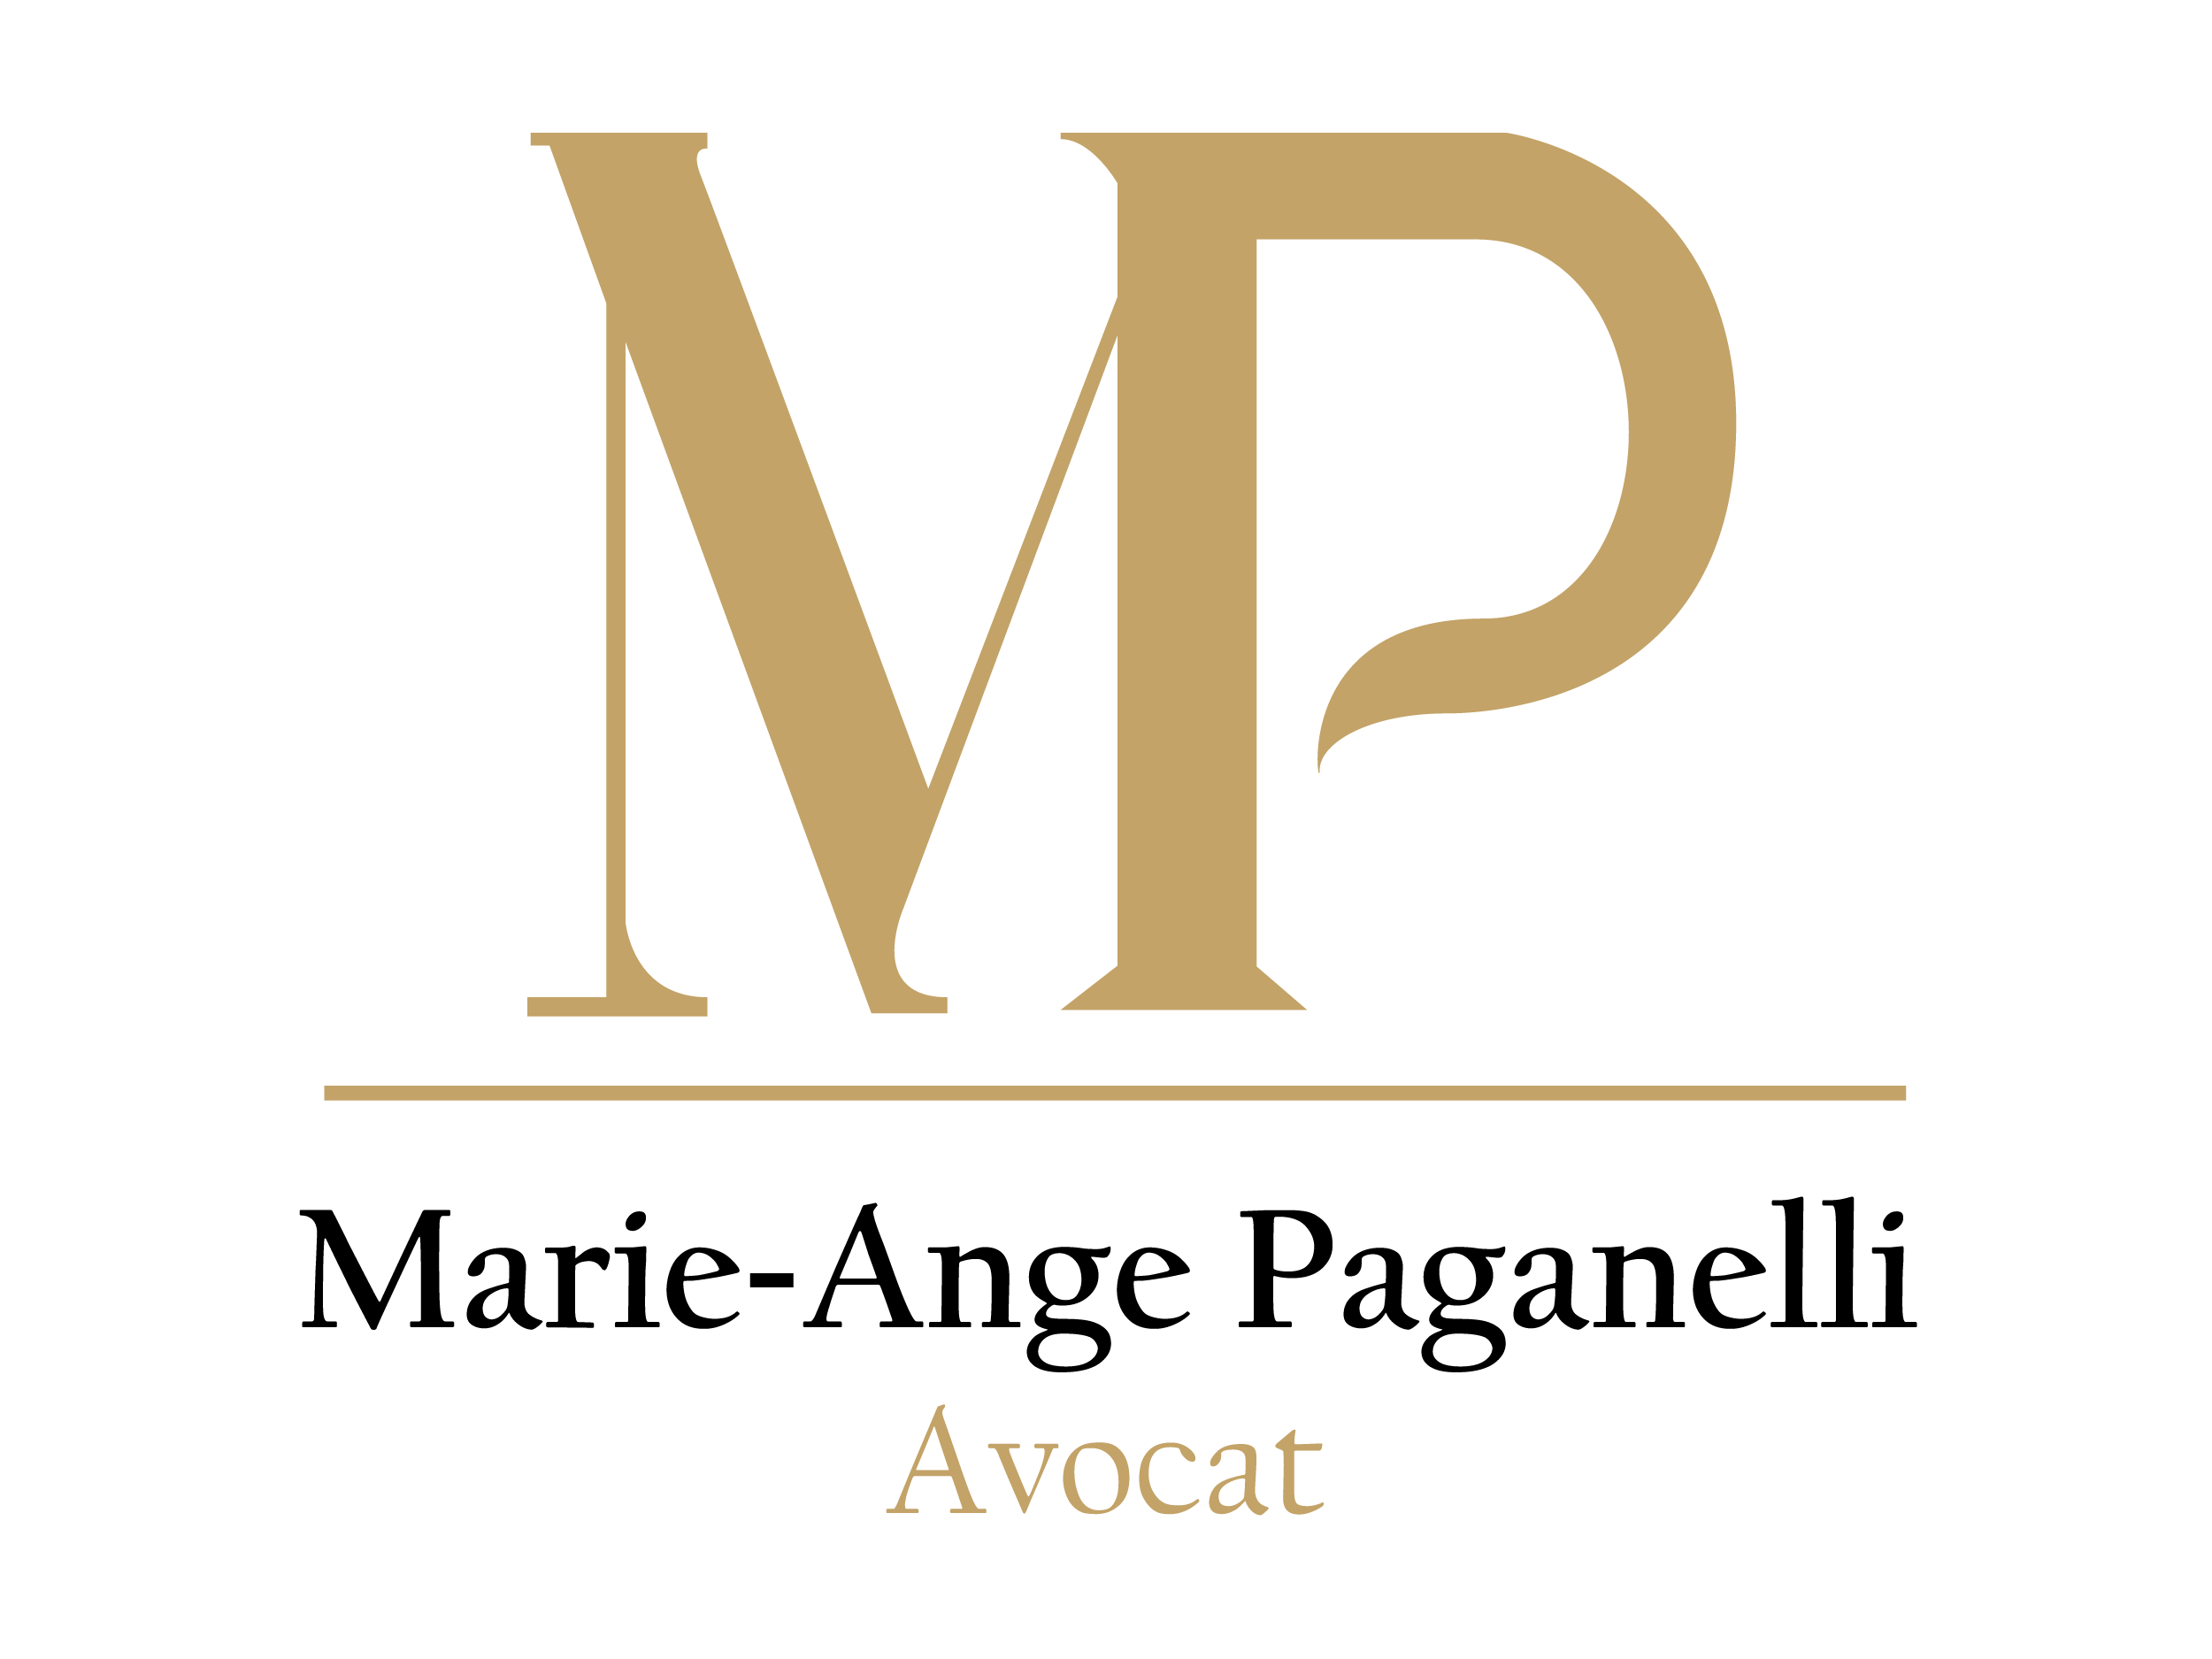 Marie-Ange PAGANELLI - Avocat au Barreau de Nice